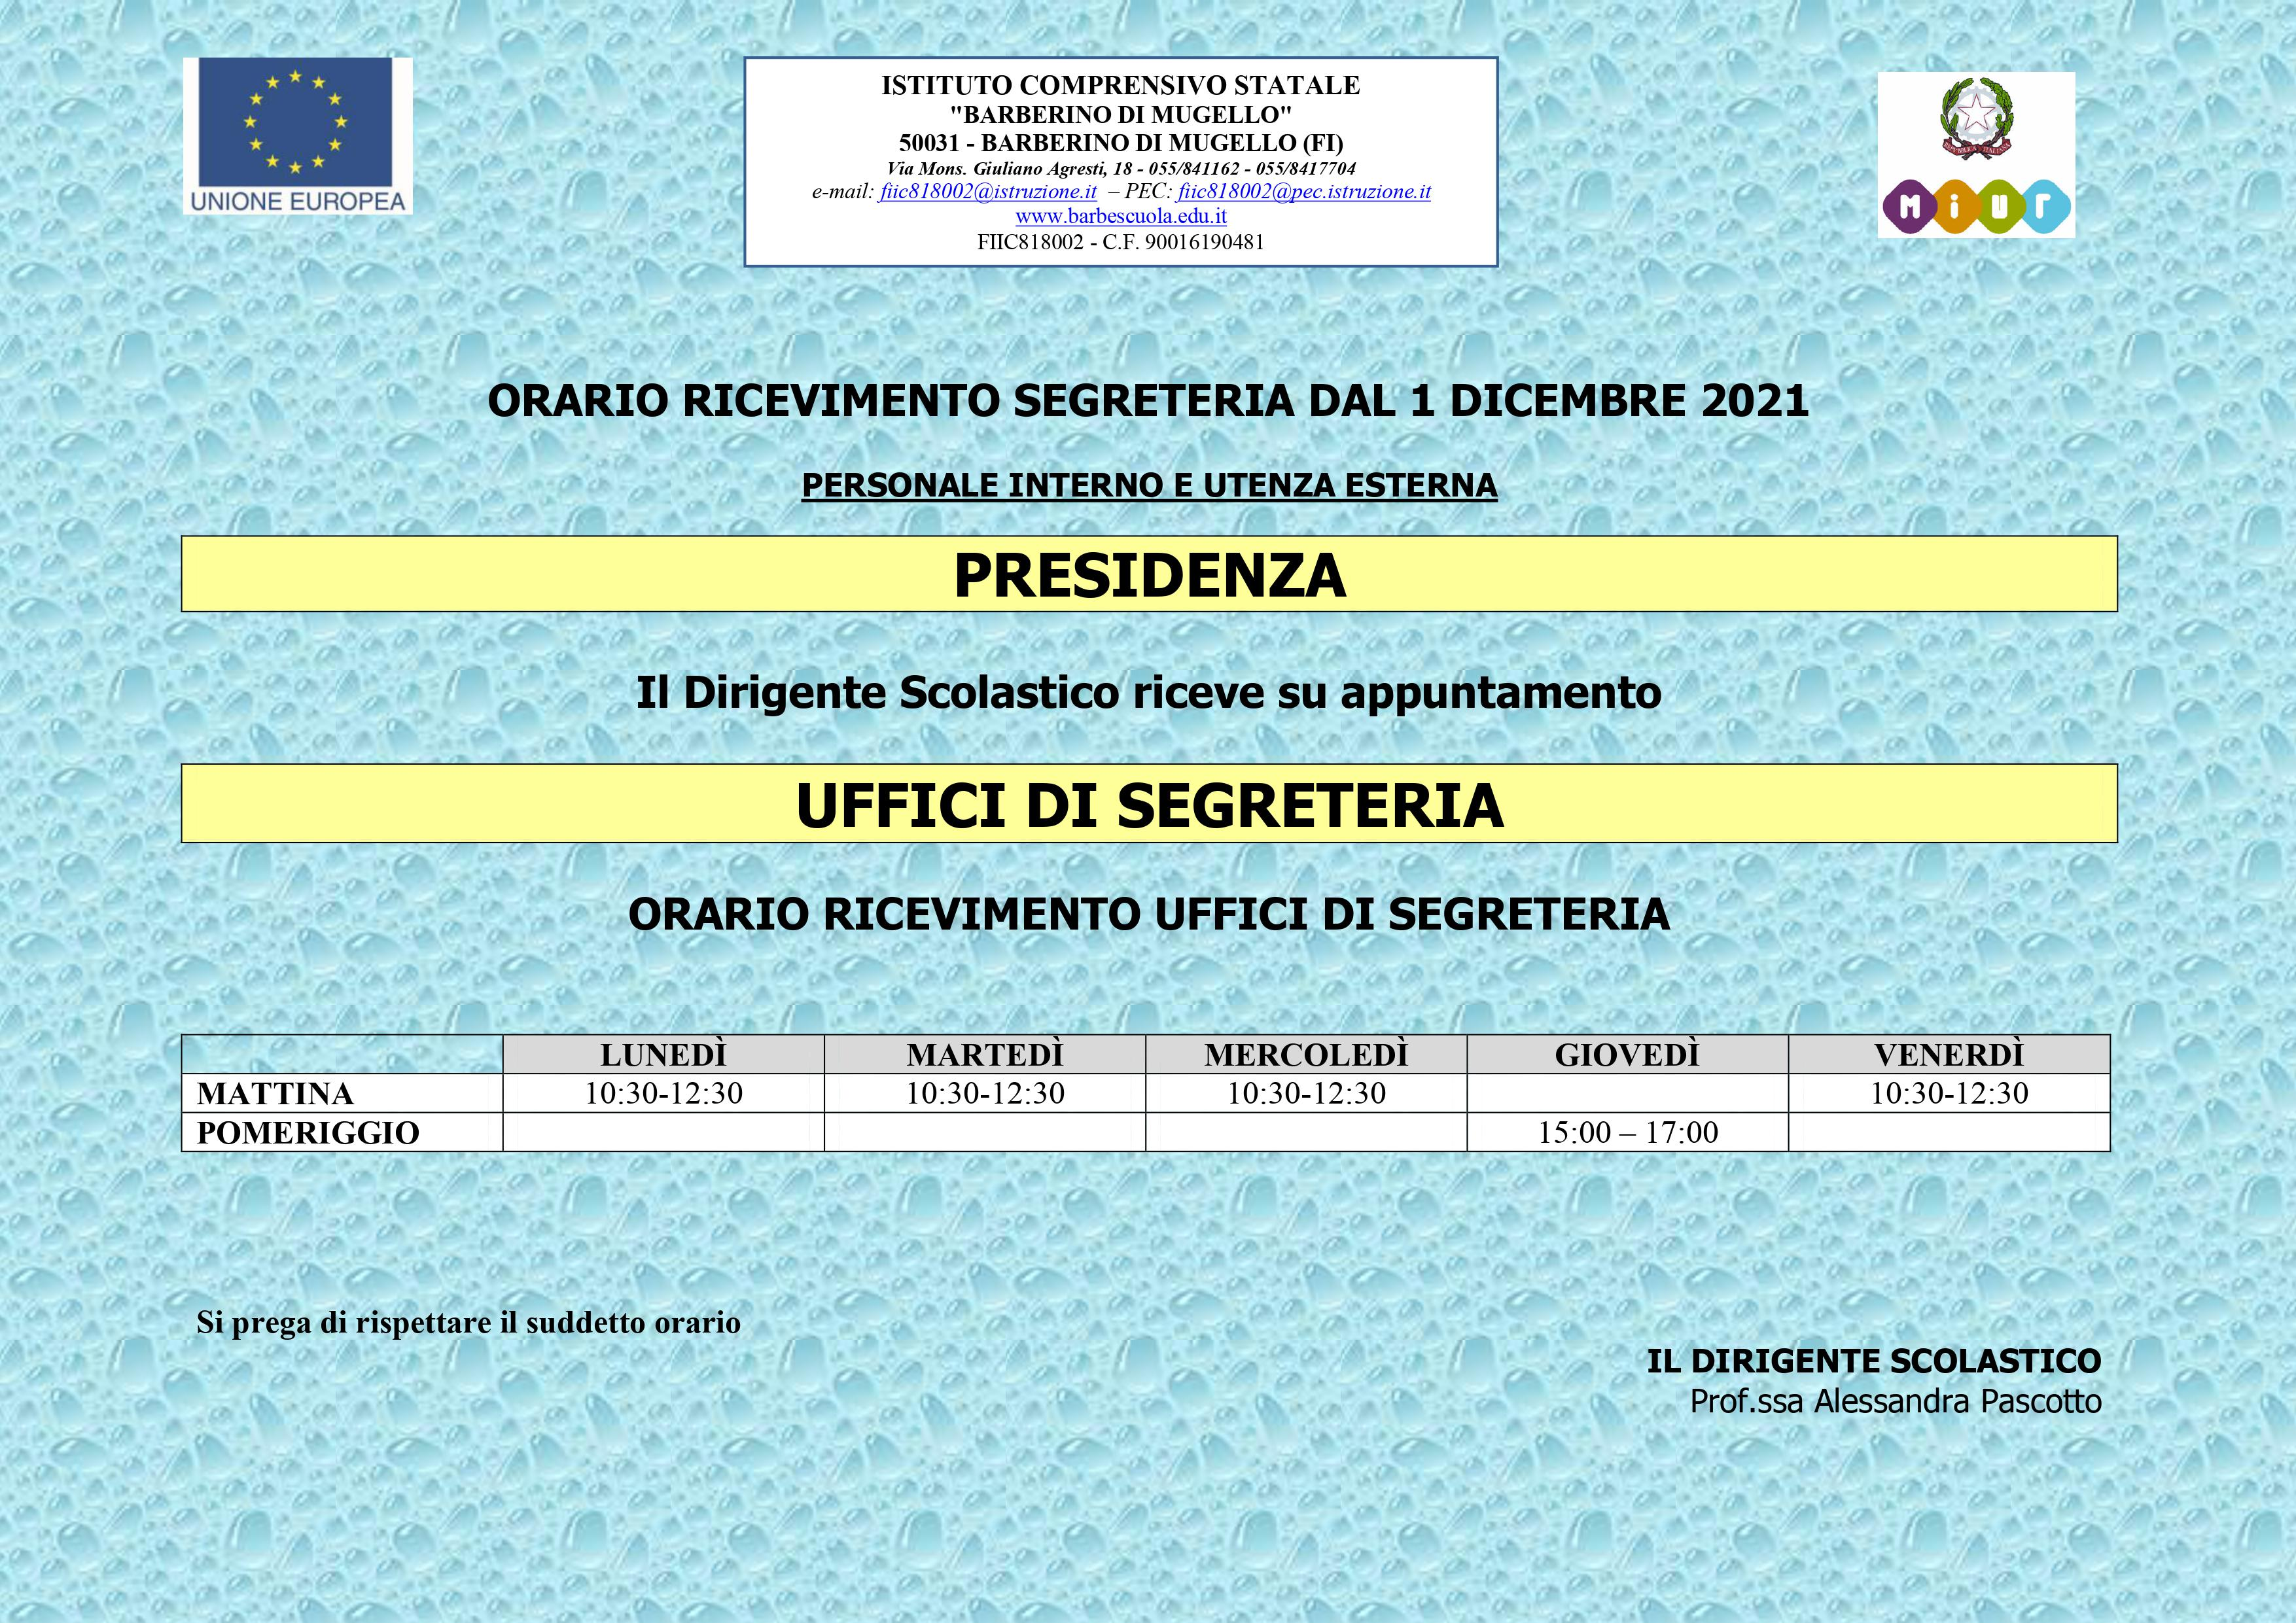 Calendario Da Settembre 2019 A Giugno 2020.Calendario Scolastico A S 2019 2020